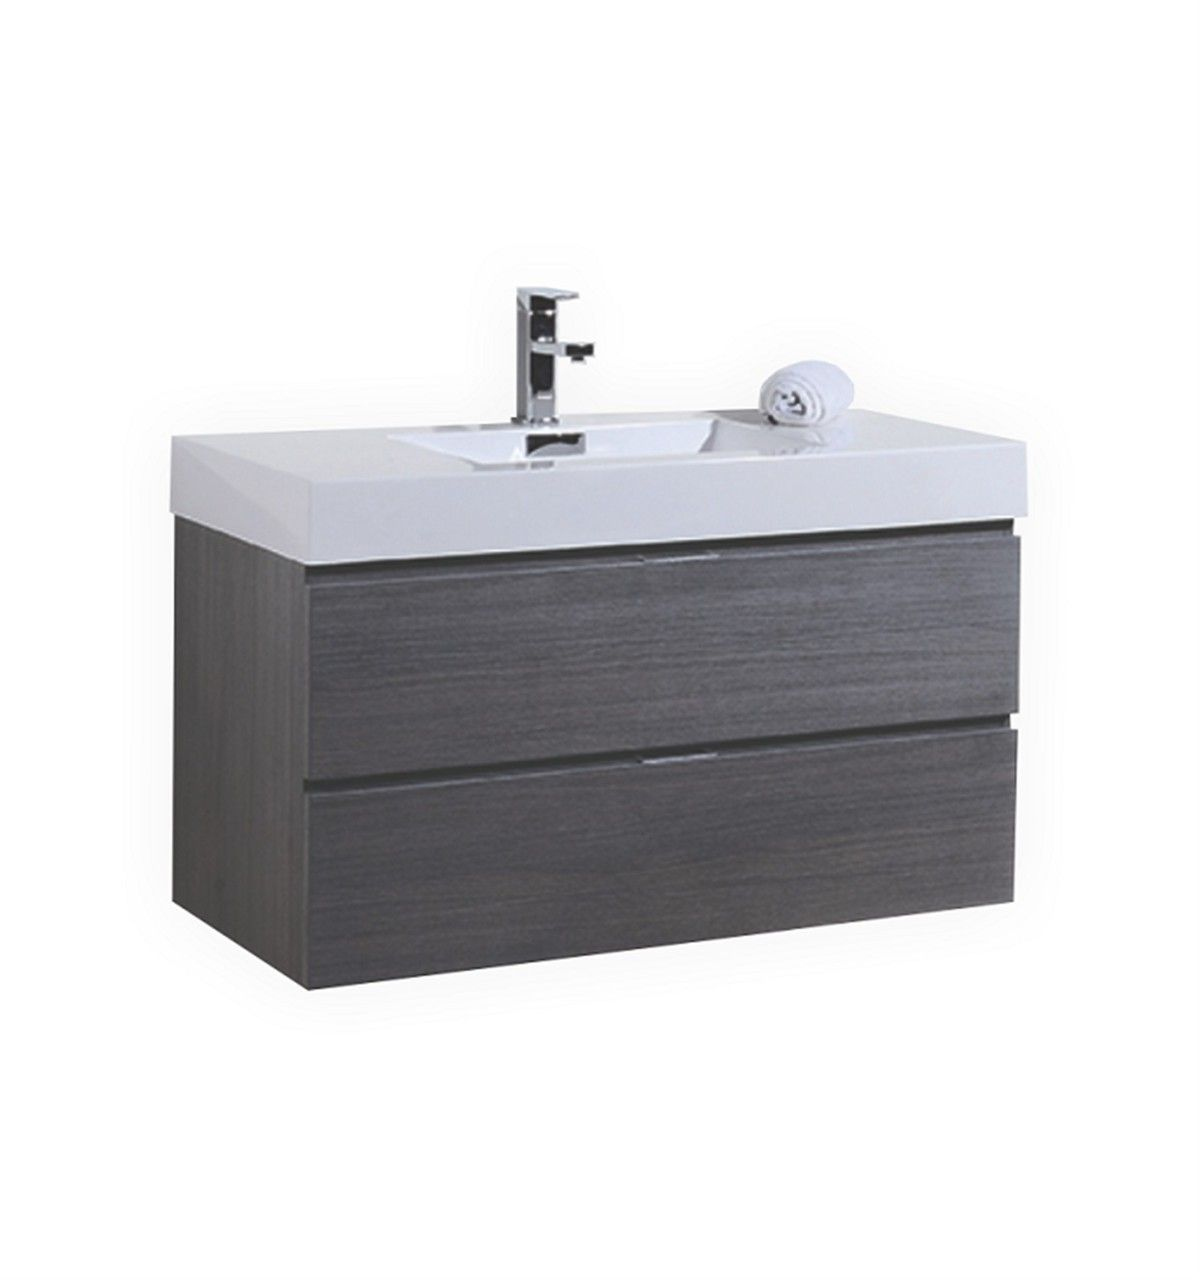 "Bliss 40"" Gray Oak Wall Mount Modern Bathroom Vanity  Modern Bath Delectable 40 Inch Bathroom Vanity Decorating Design"